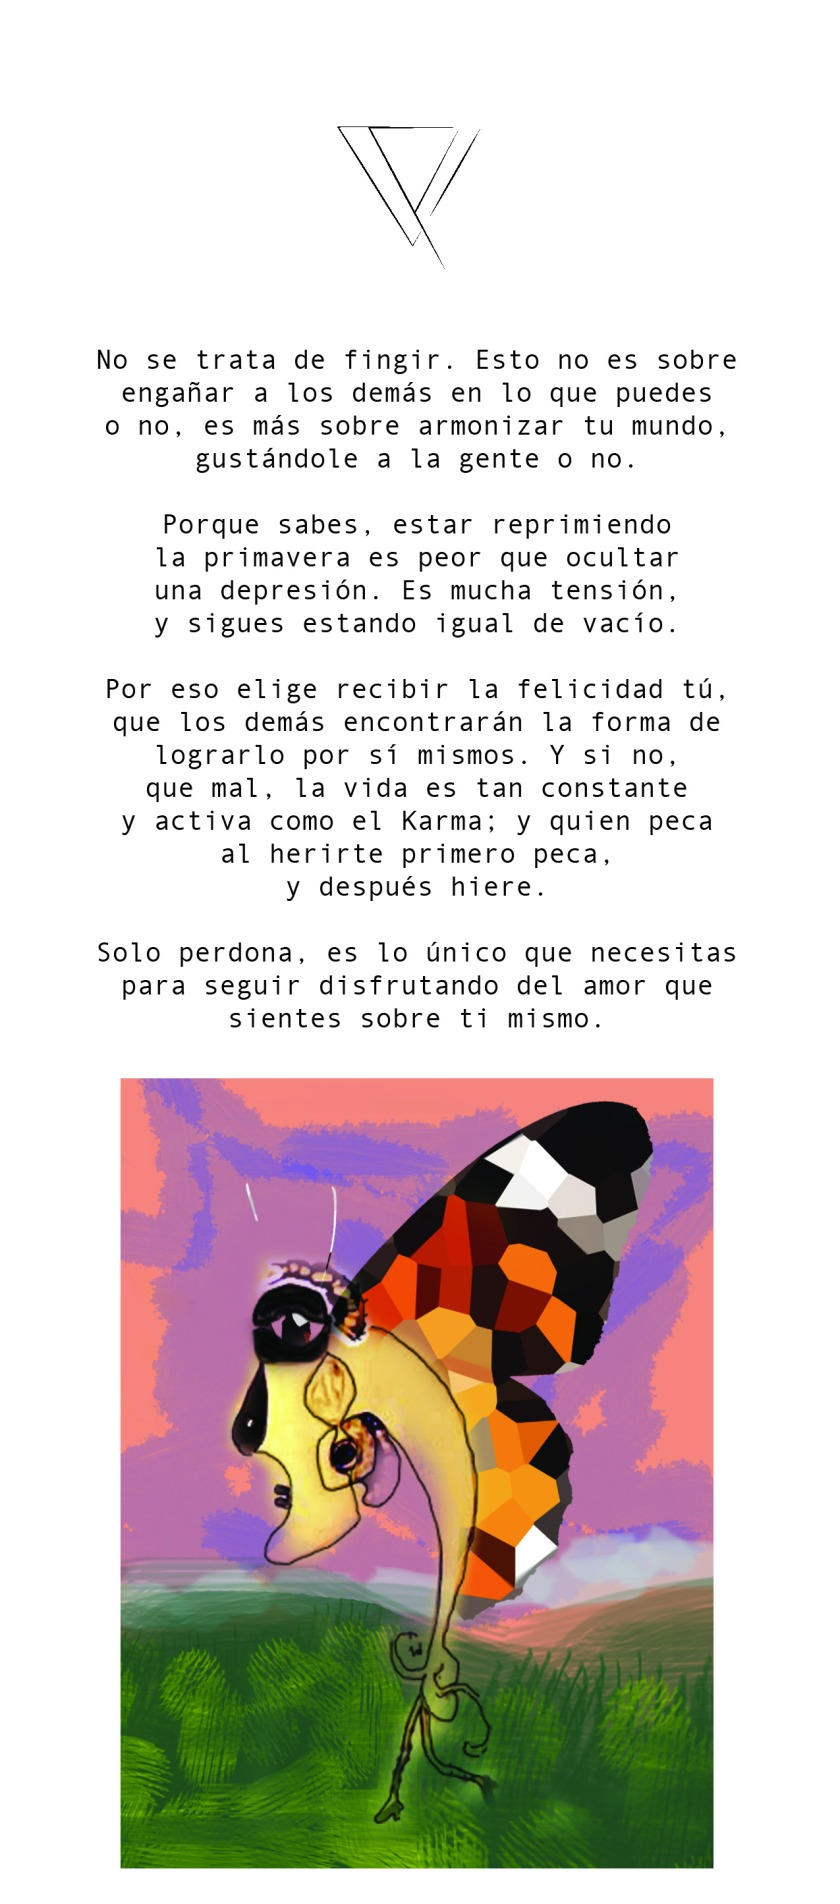 Poesía digital 1- etapa 2-08